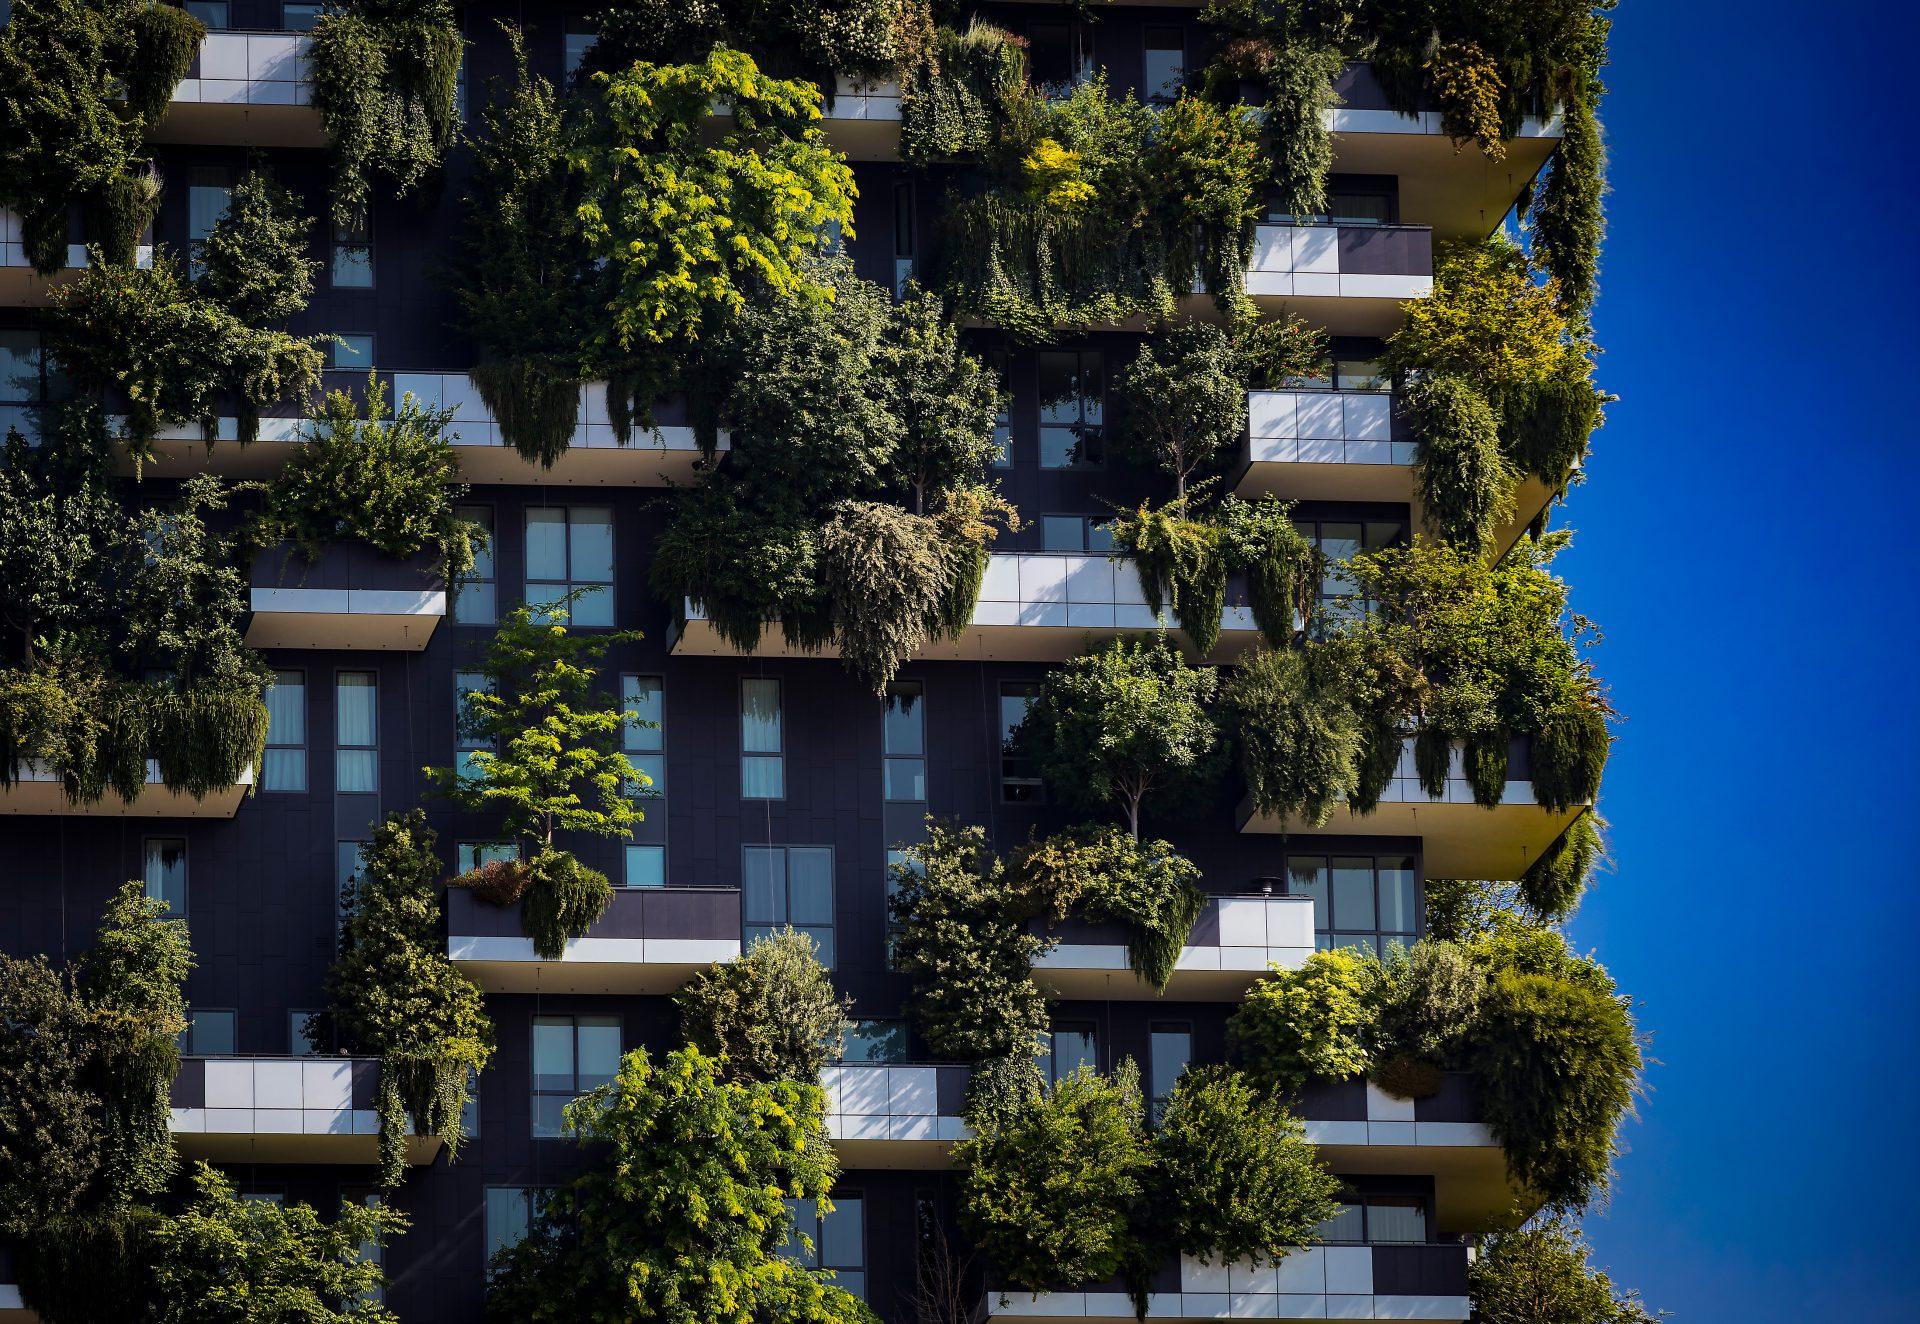 Milan,,Italy,-,6,June,2018:,Bosco,Verticale.two,Modern,Buildings